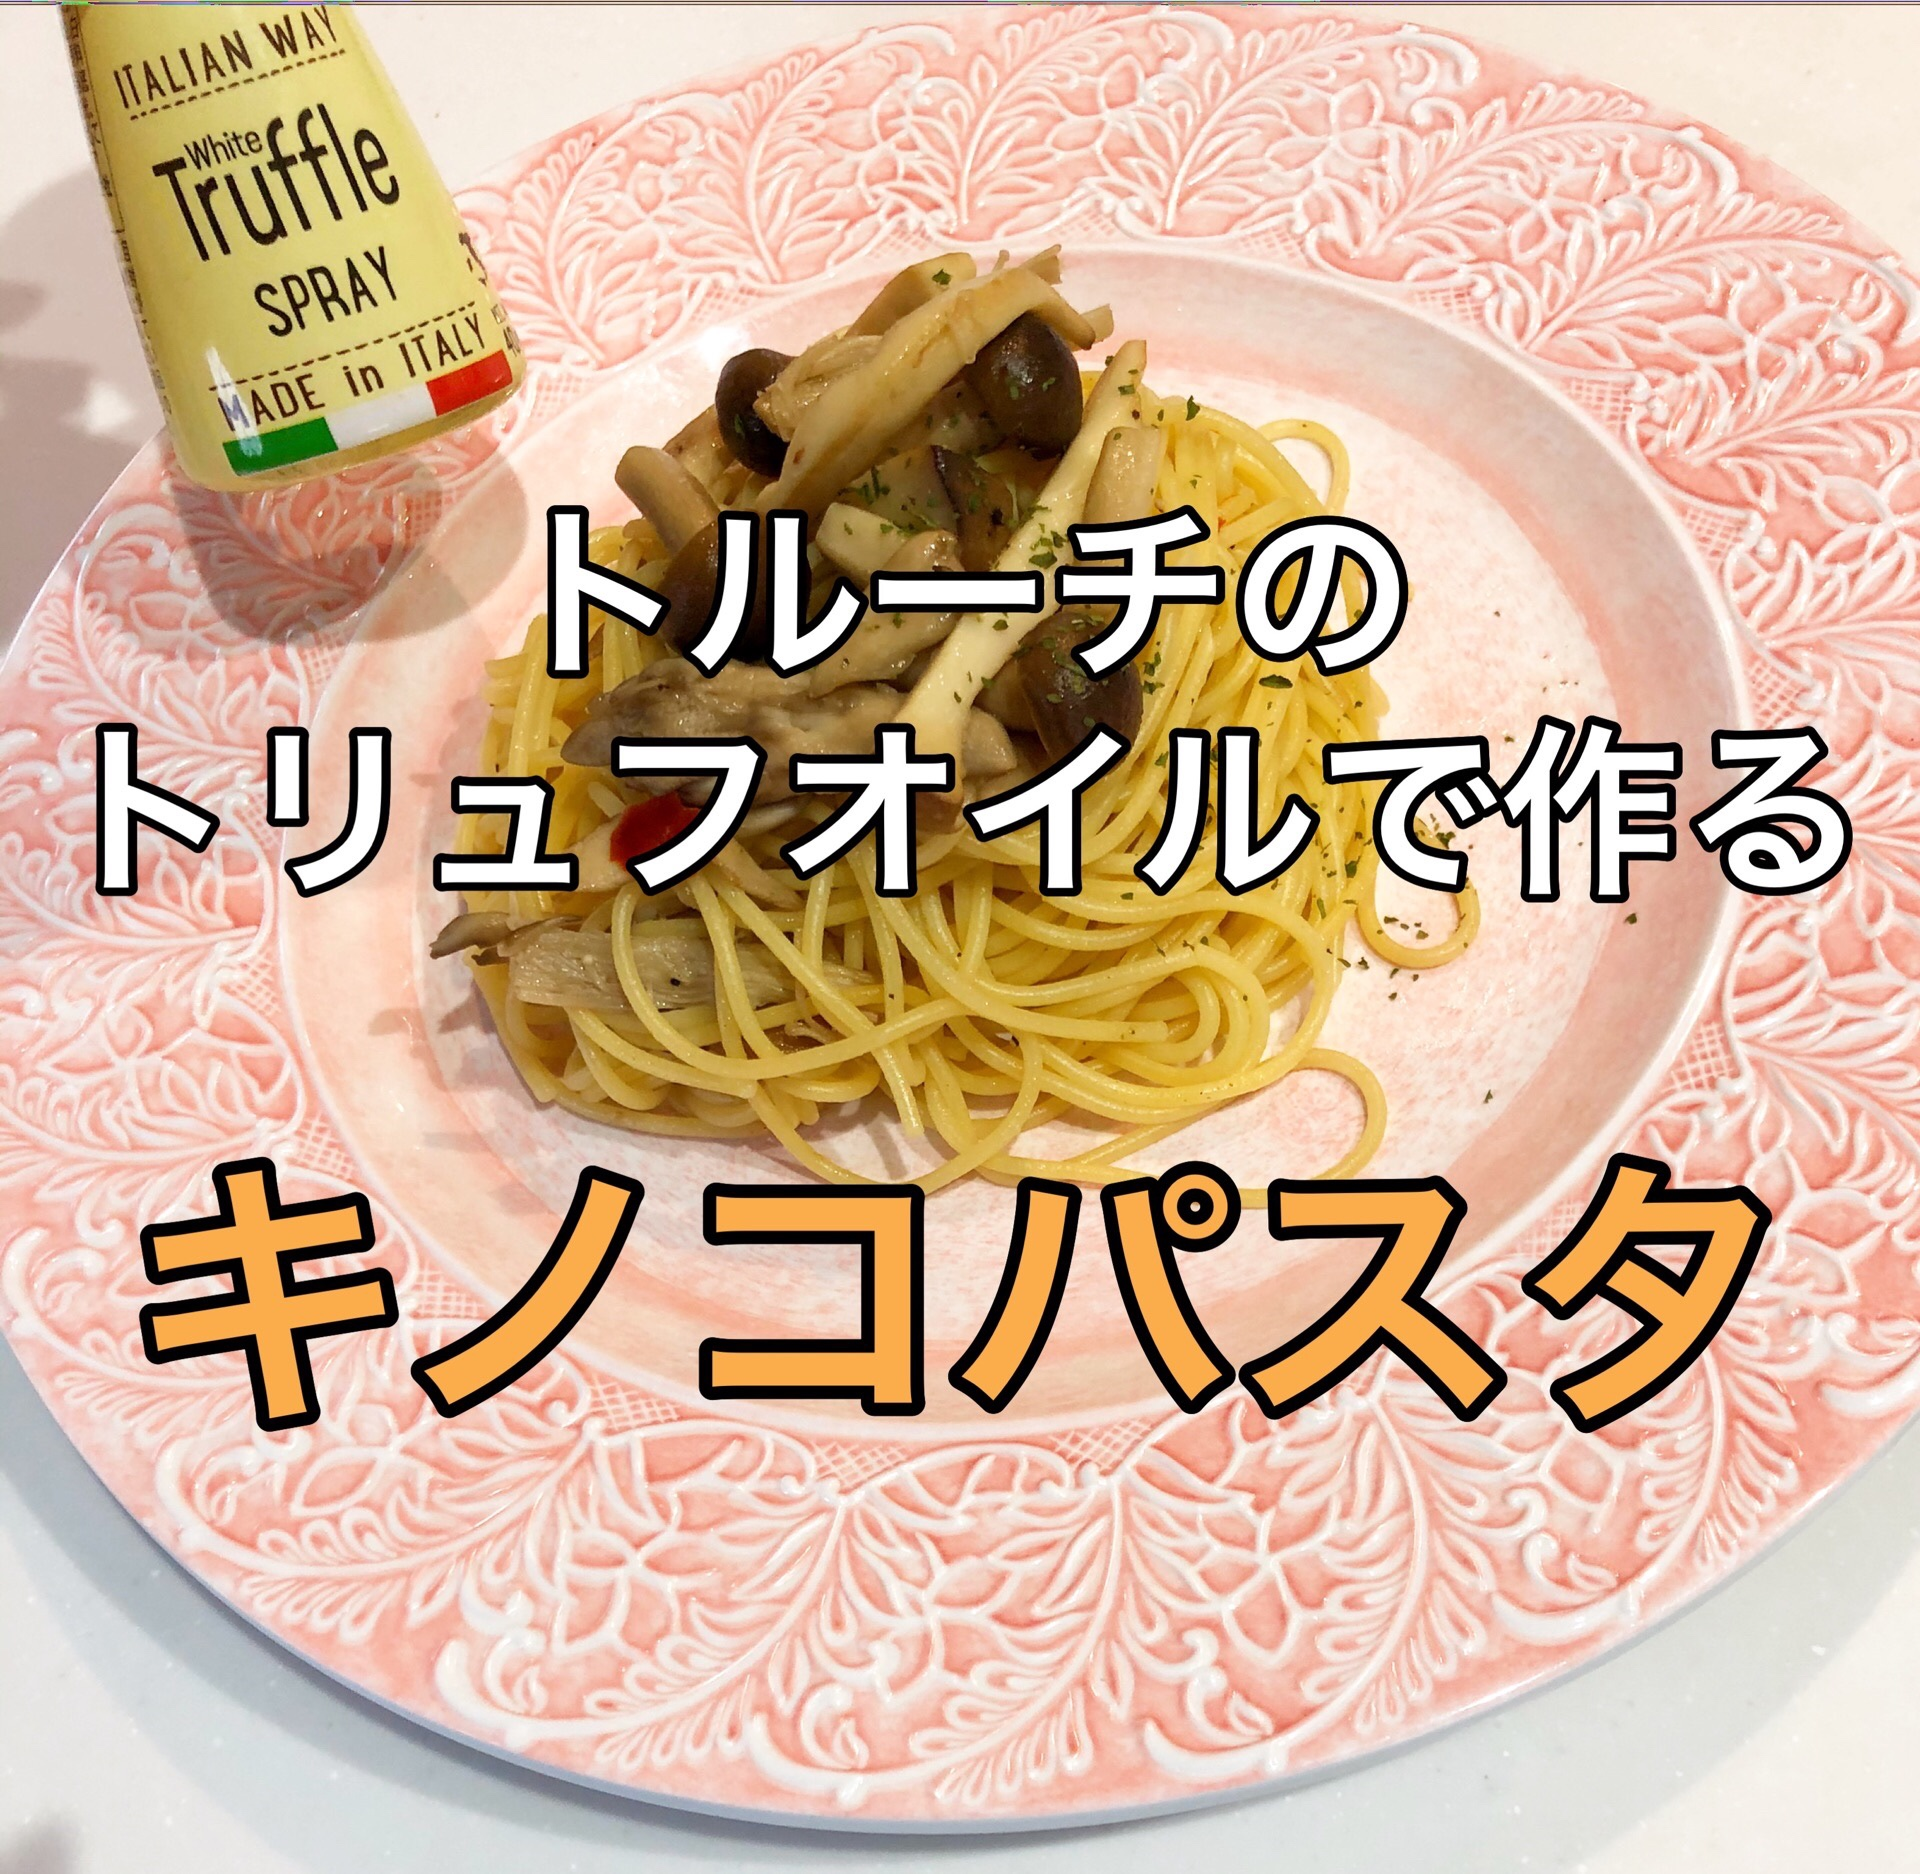 Truc Italian Way Truffle Oil